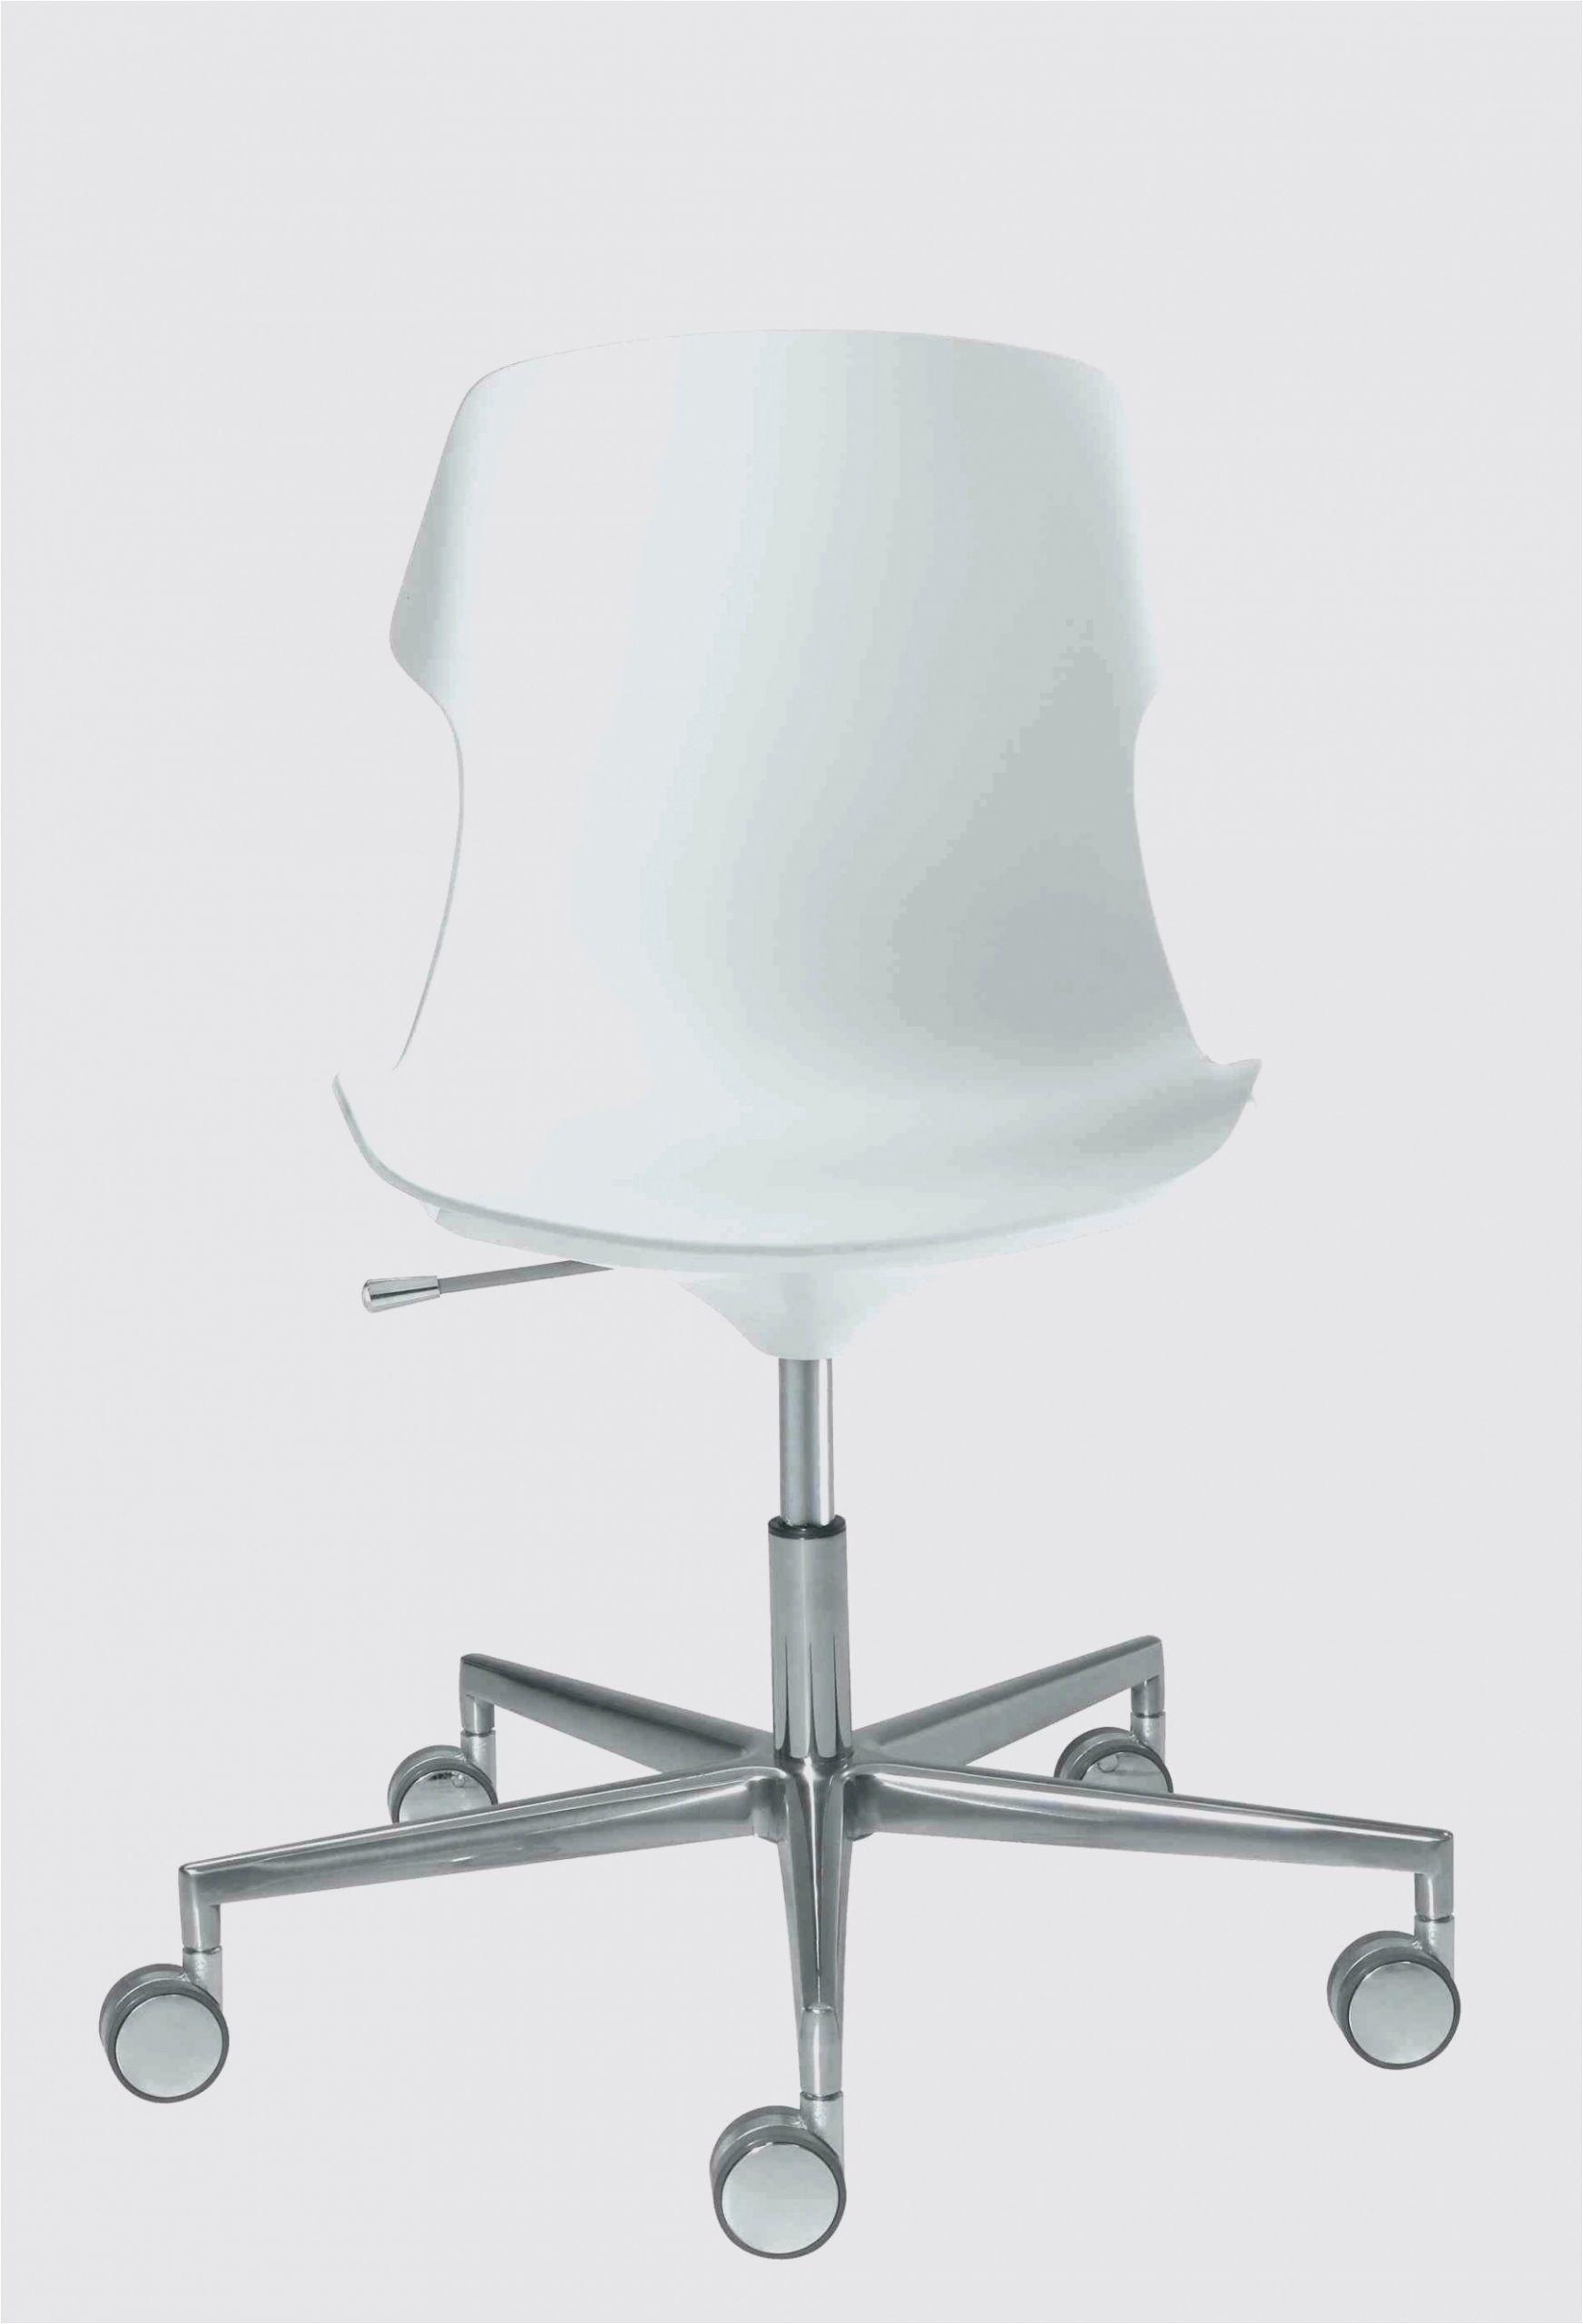 fauteuil relax scandinave photo de leroy merlin chaise fauteuil relax salon meilleur fauteuil salon 0d of fauteuil relax scandinave